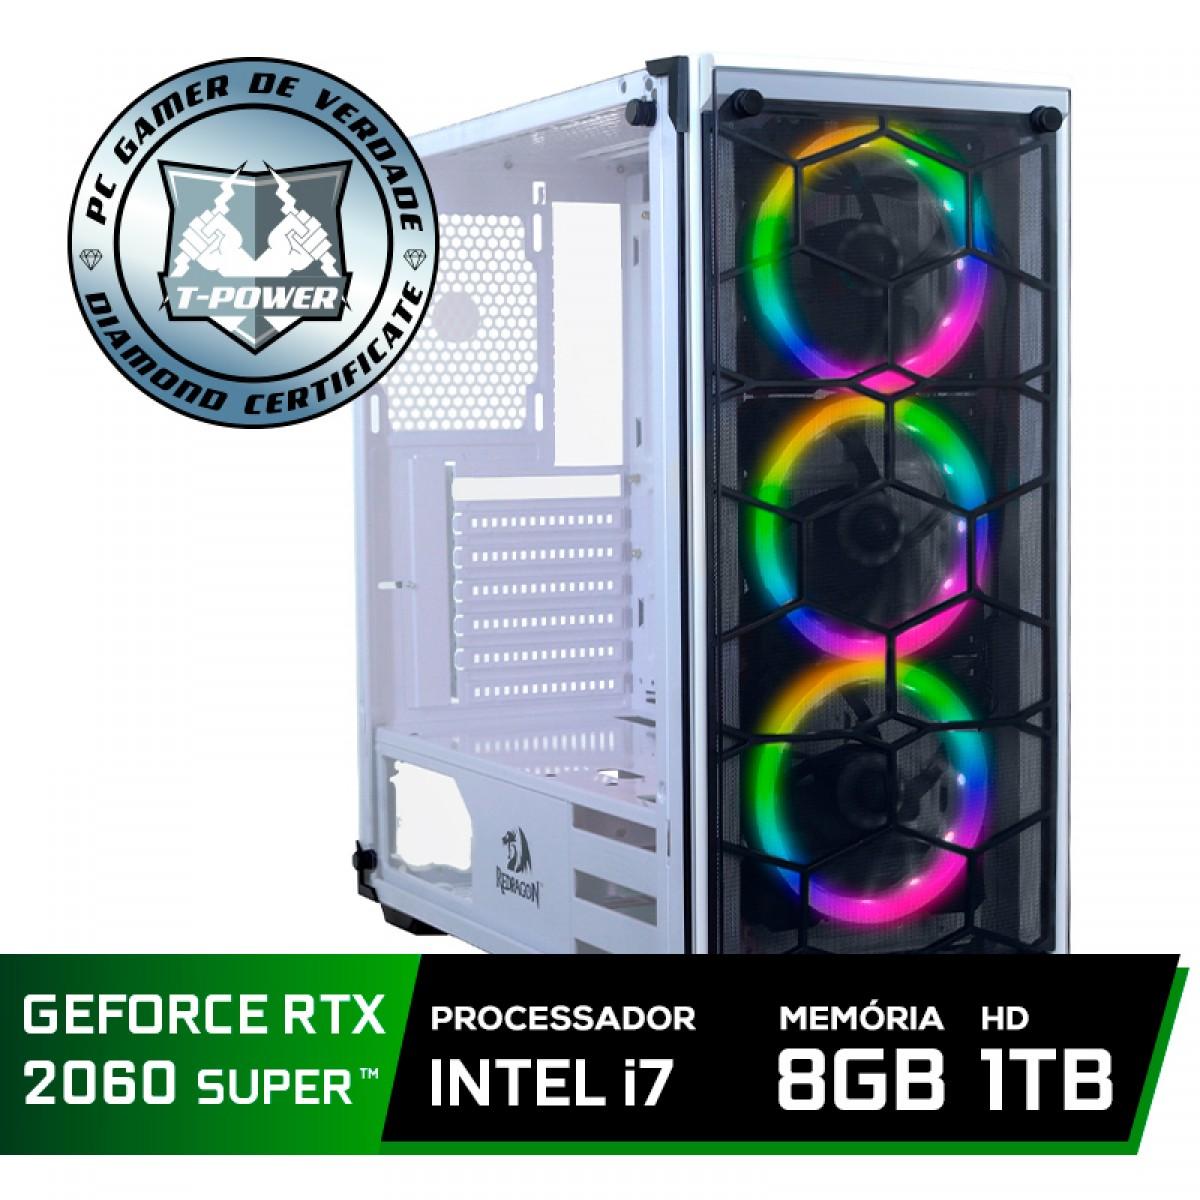 Pc Gamer Tera Edition Intel i7 9700F / Geforce RTX 2060 Super / DDR4 8GB / HD 1TB / 600W